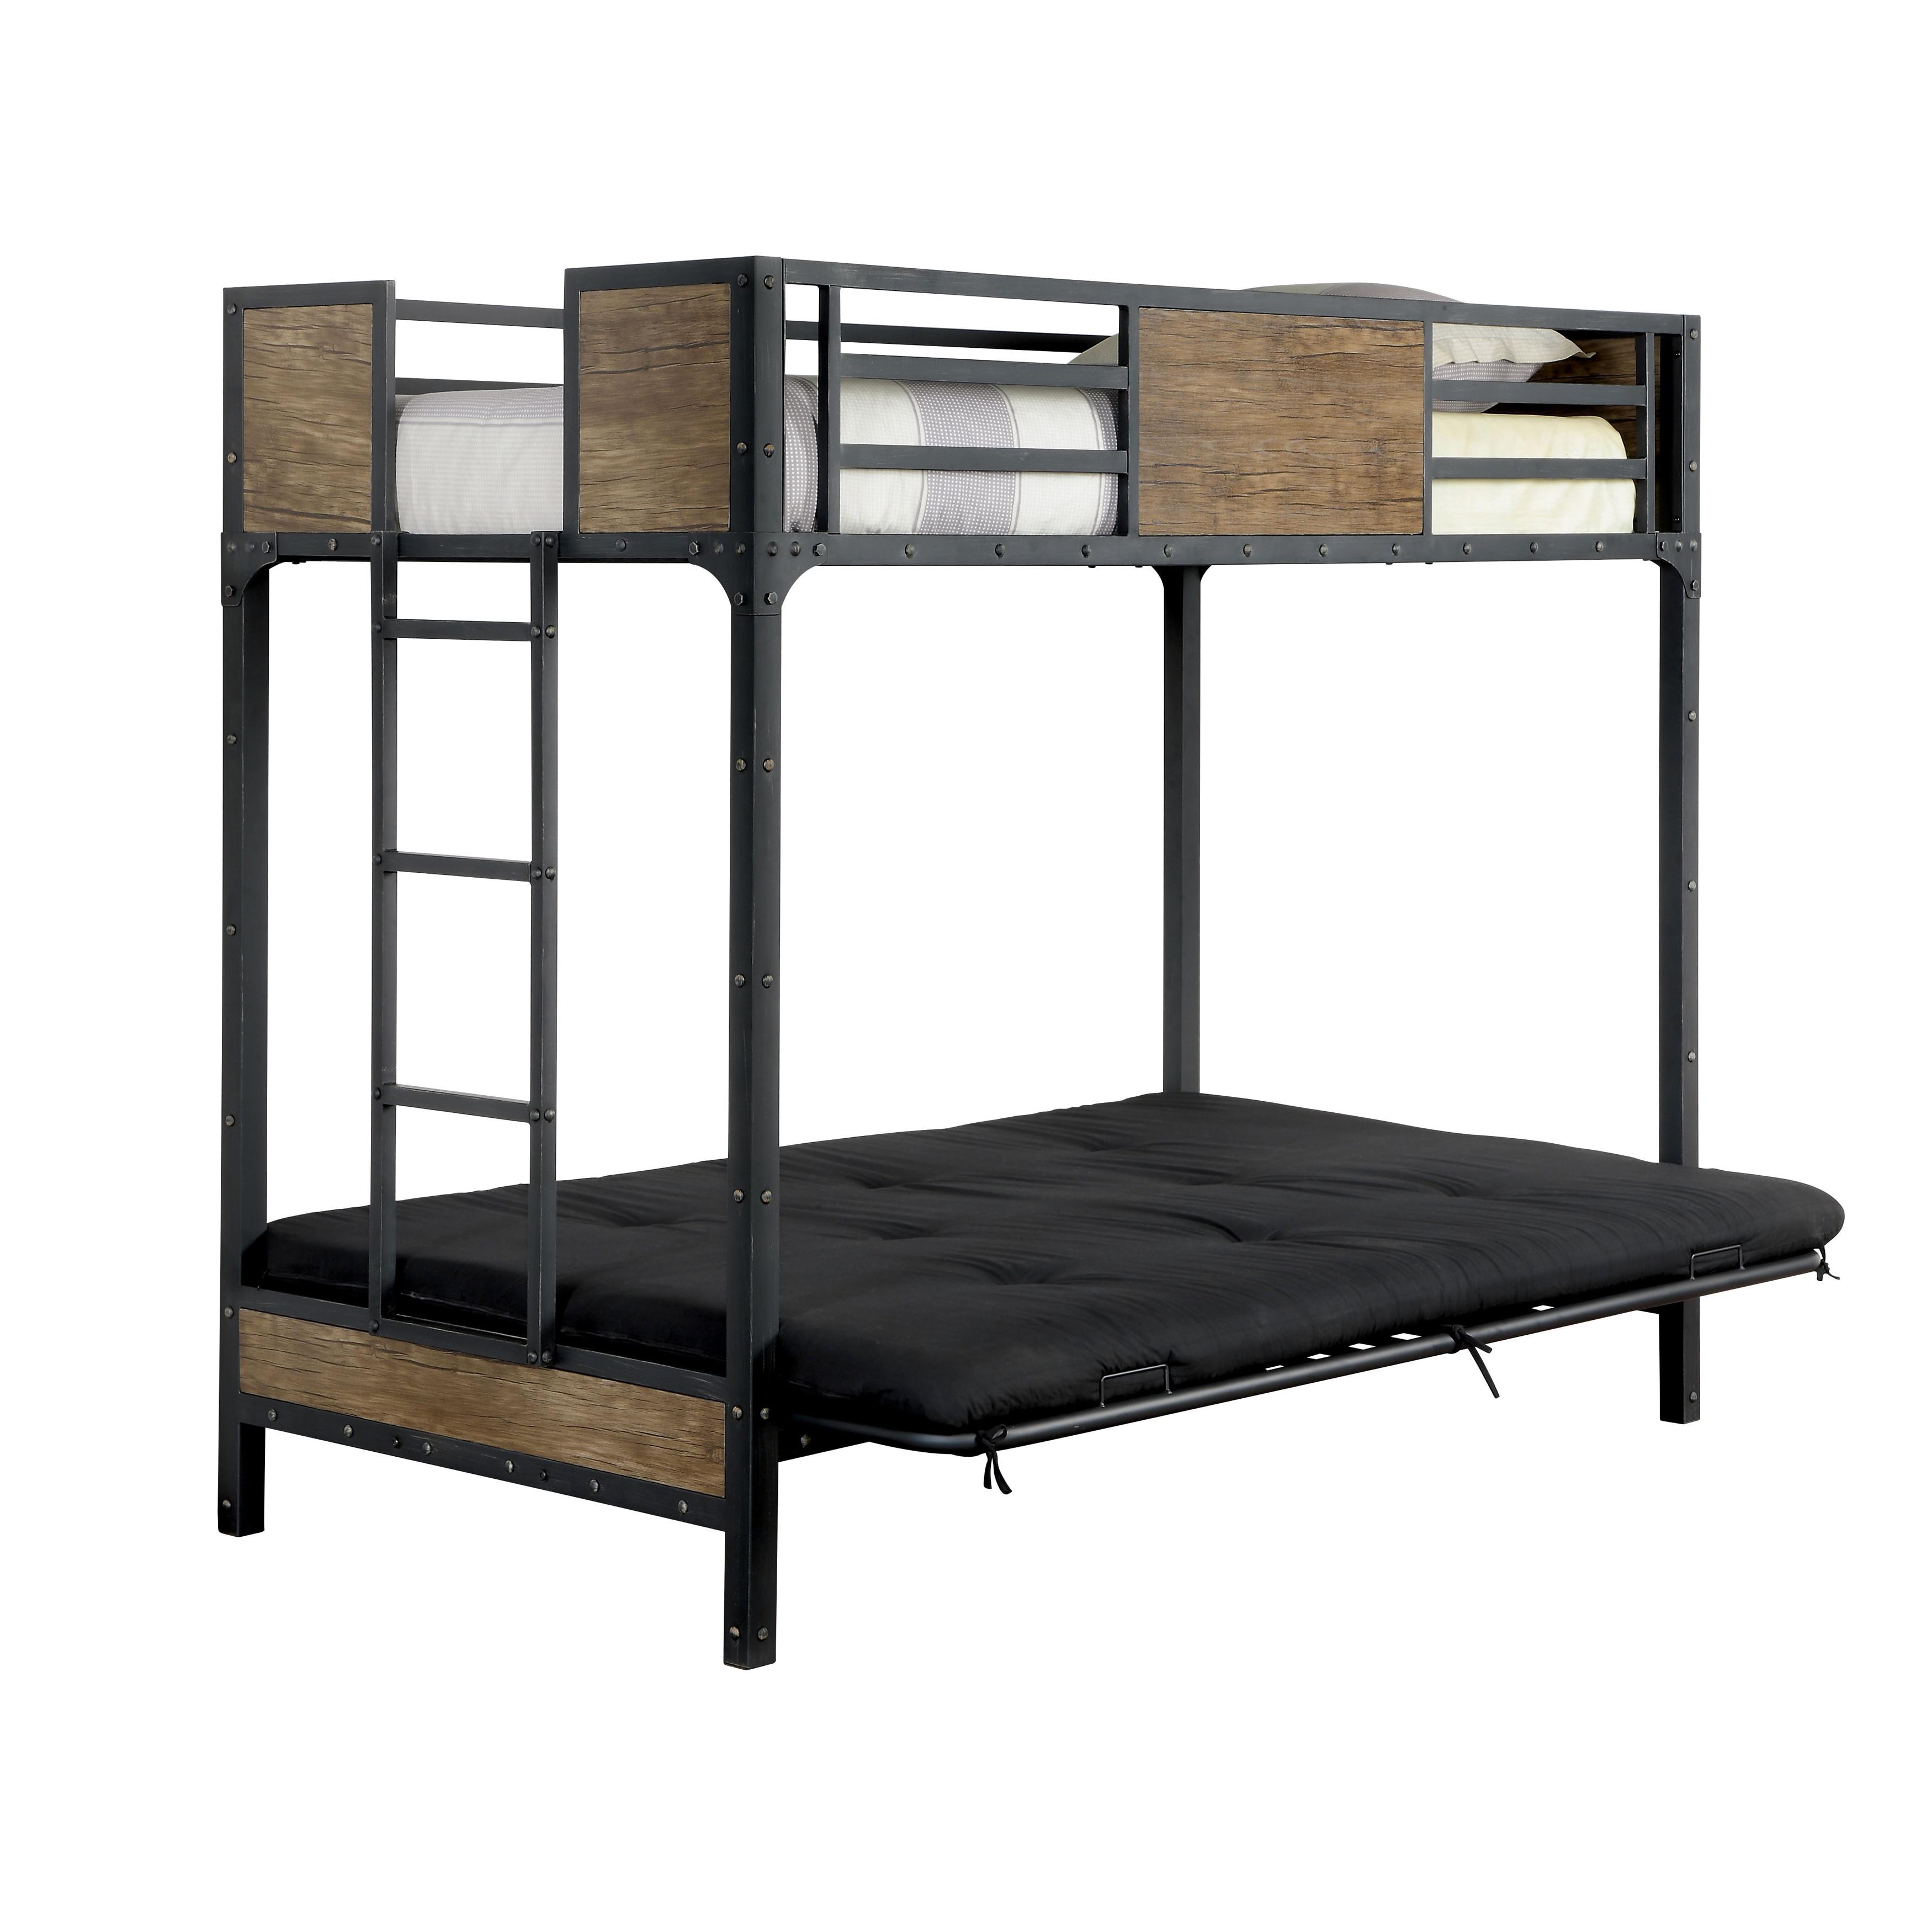 cm ideas ideass las size design home base best beautiful futons futon rainbow twin vegas of collection lovely full bk